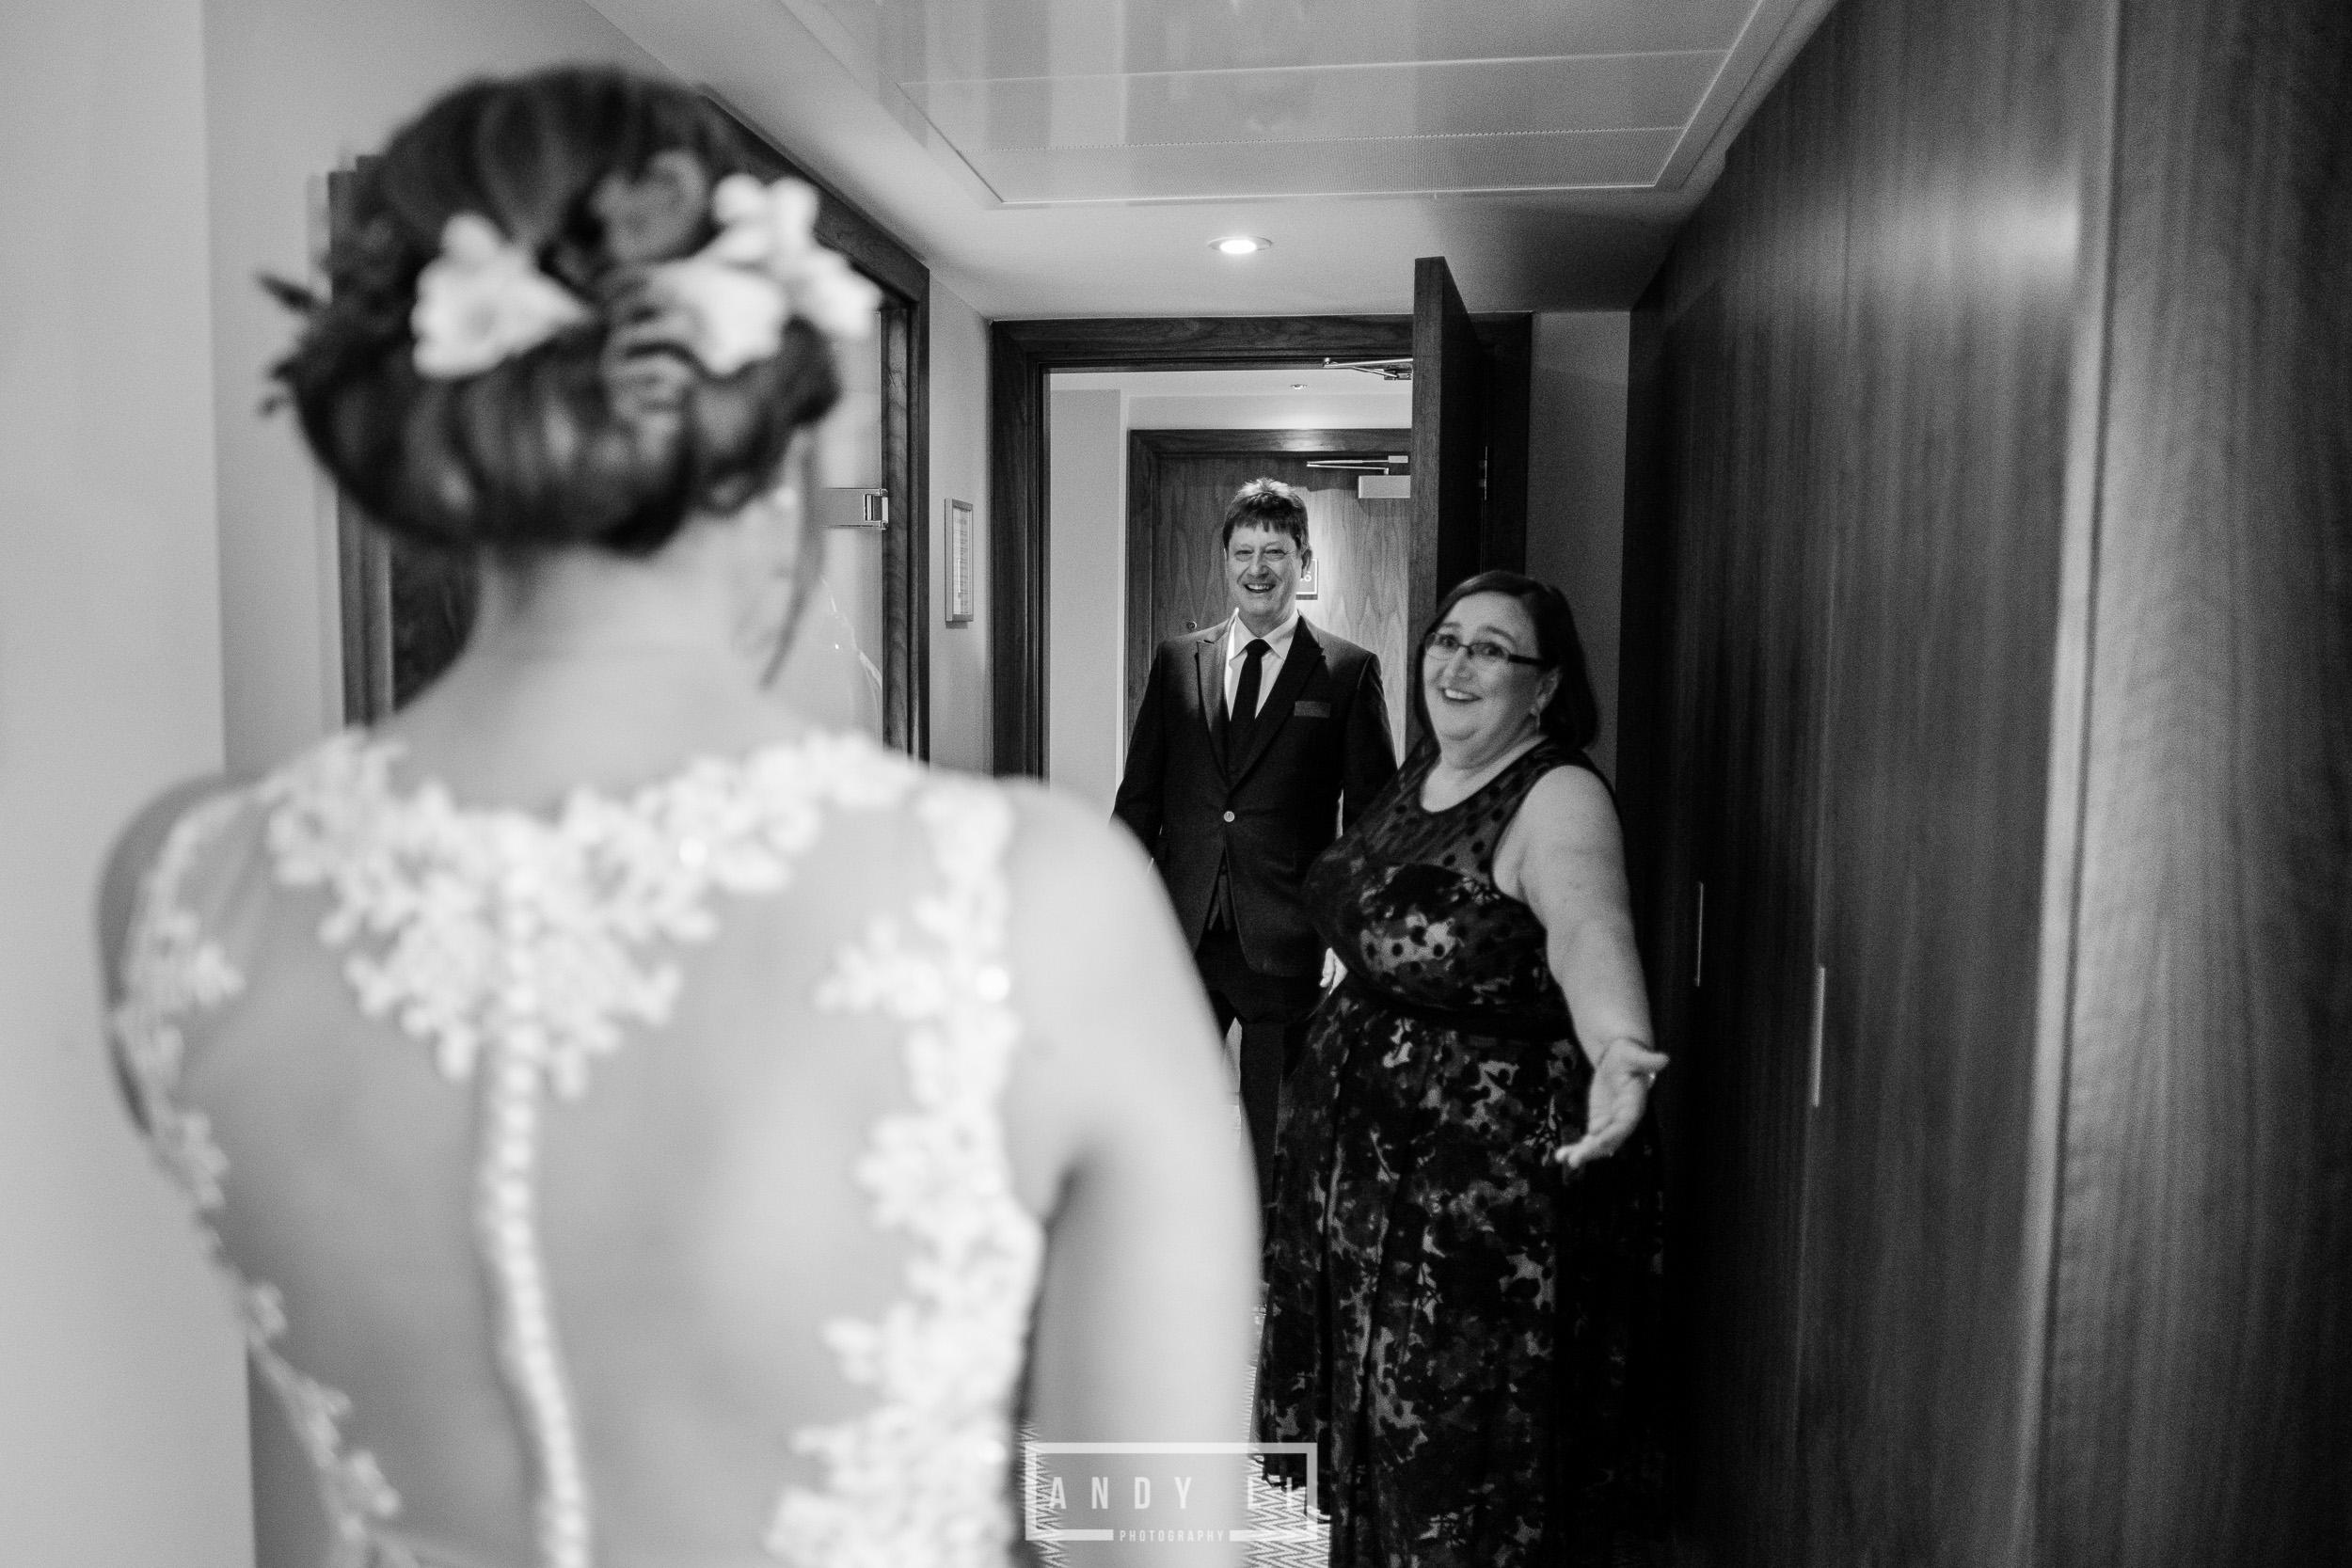 Belle Epoque Wedding Photographer-004-XPRO2333.jpg